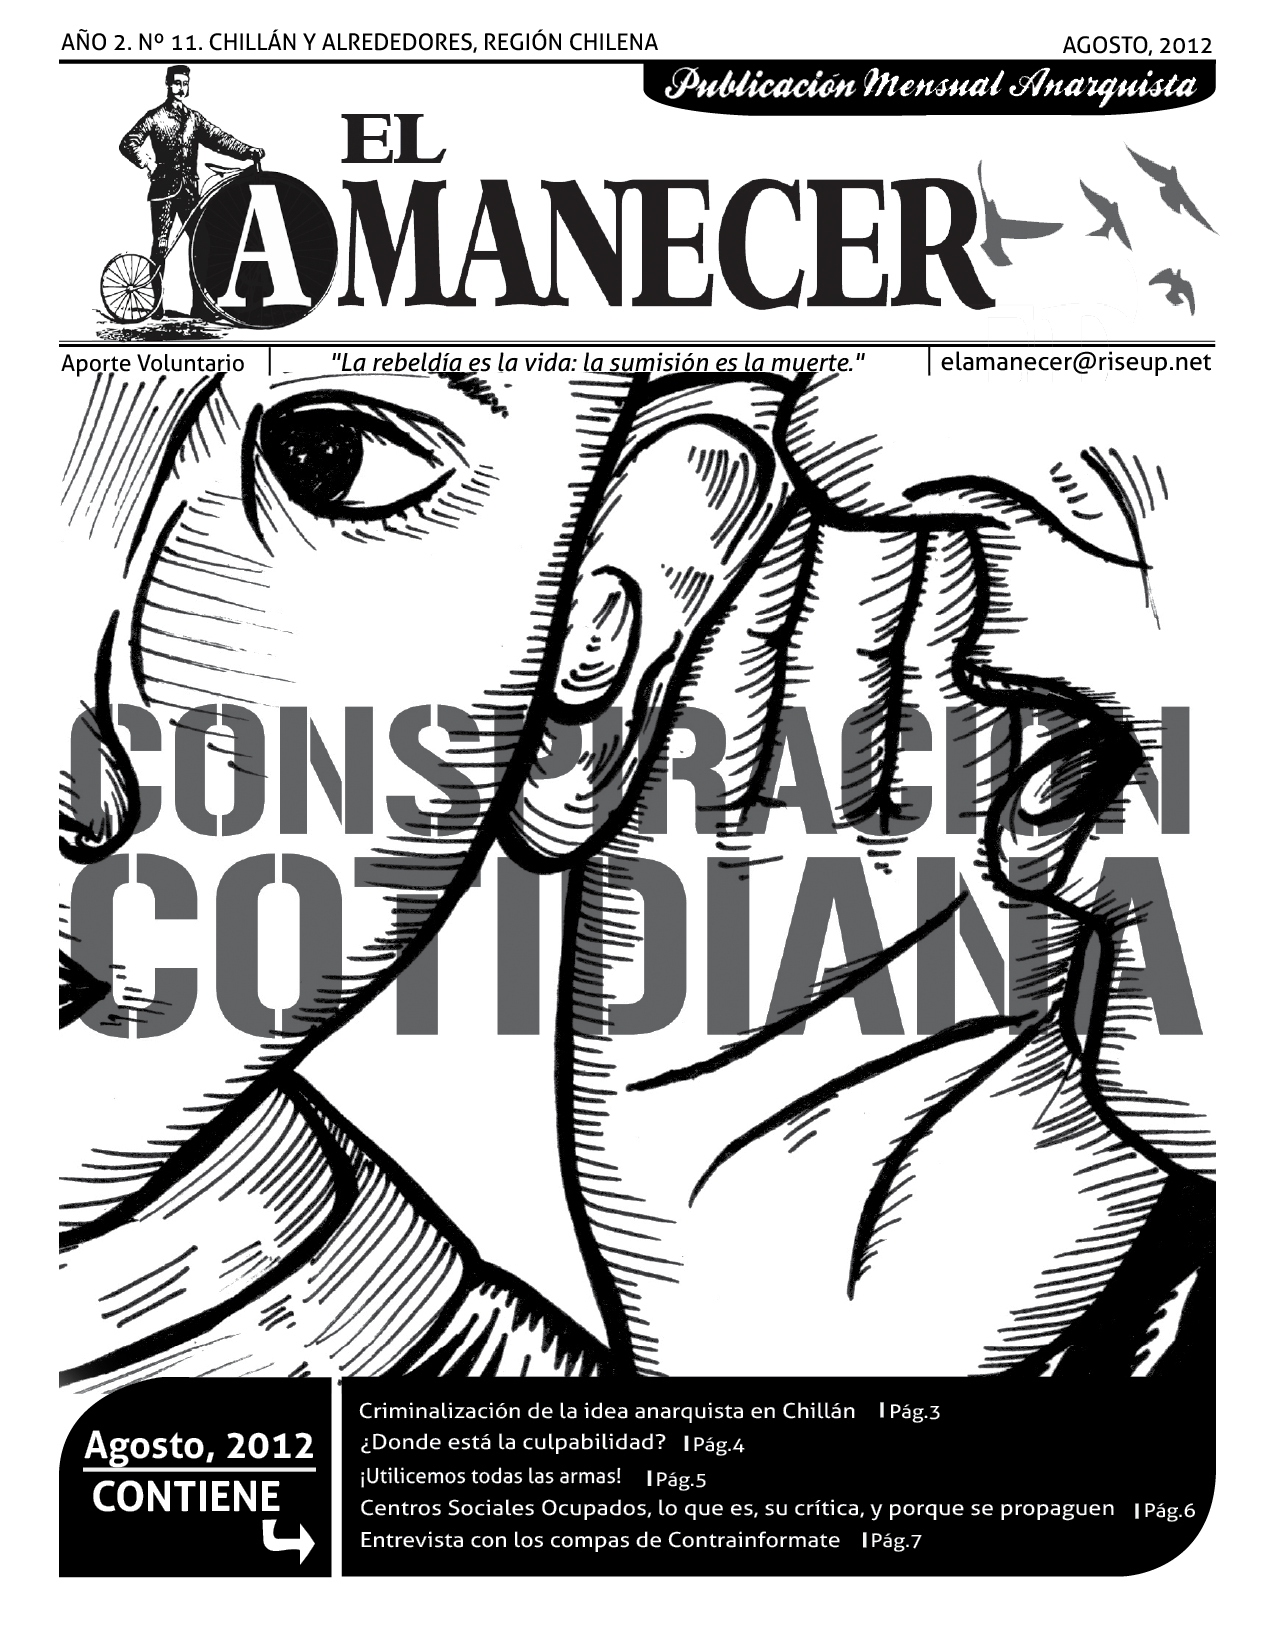 http://periodicoelamanecer.files.wordpress.com/2012/08/periodico-anarquista-el-amanecer-agosto-2012.jpg